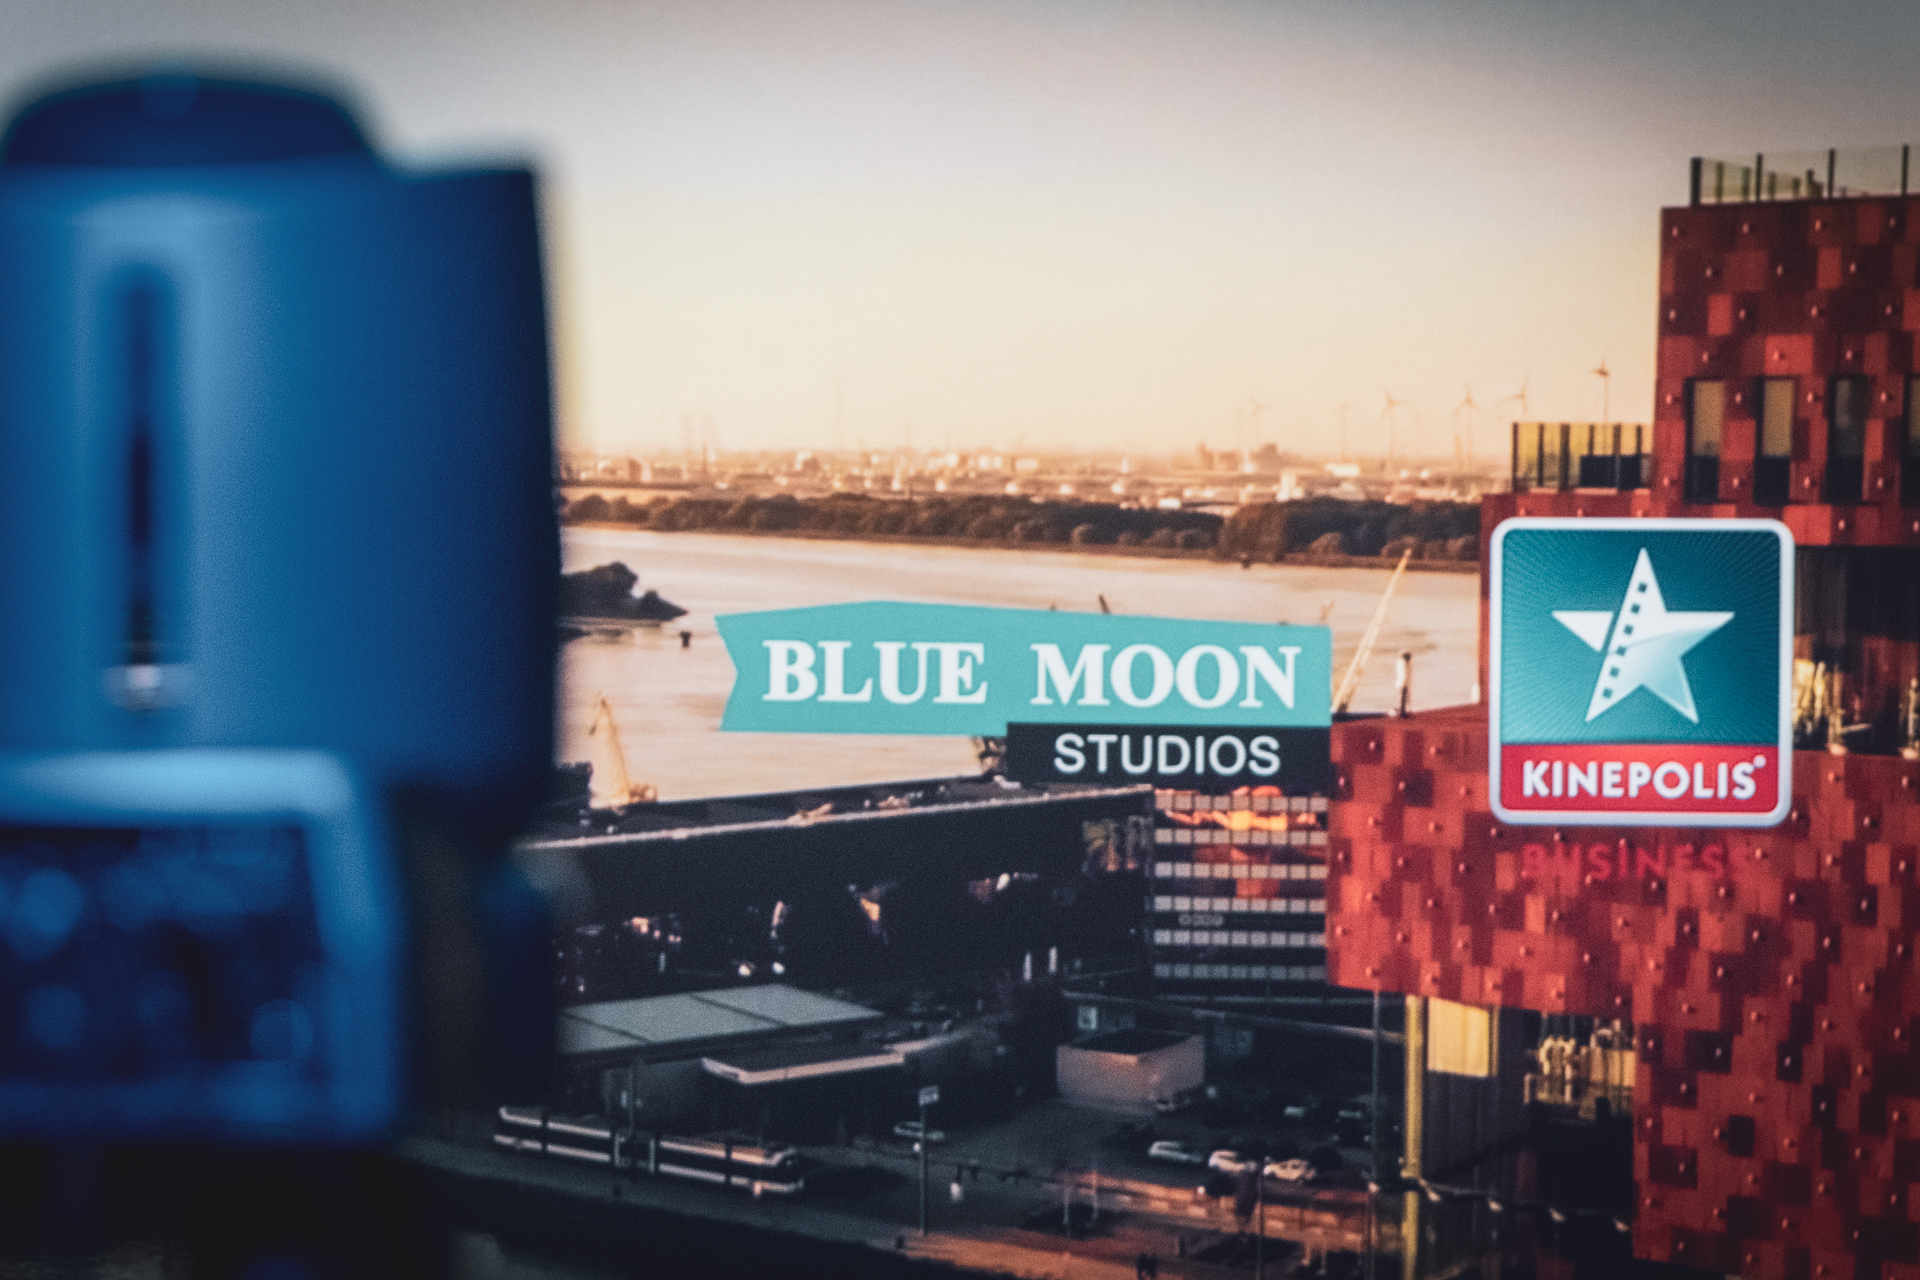 BLUE-MOON_studios-at-KINEPOLIS_BTS_24